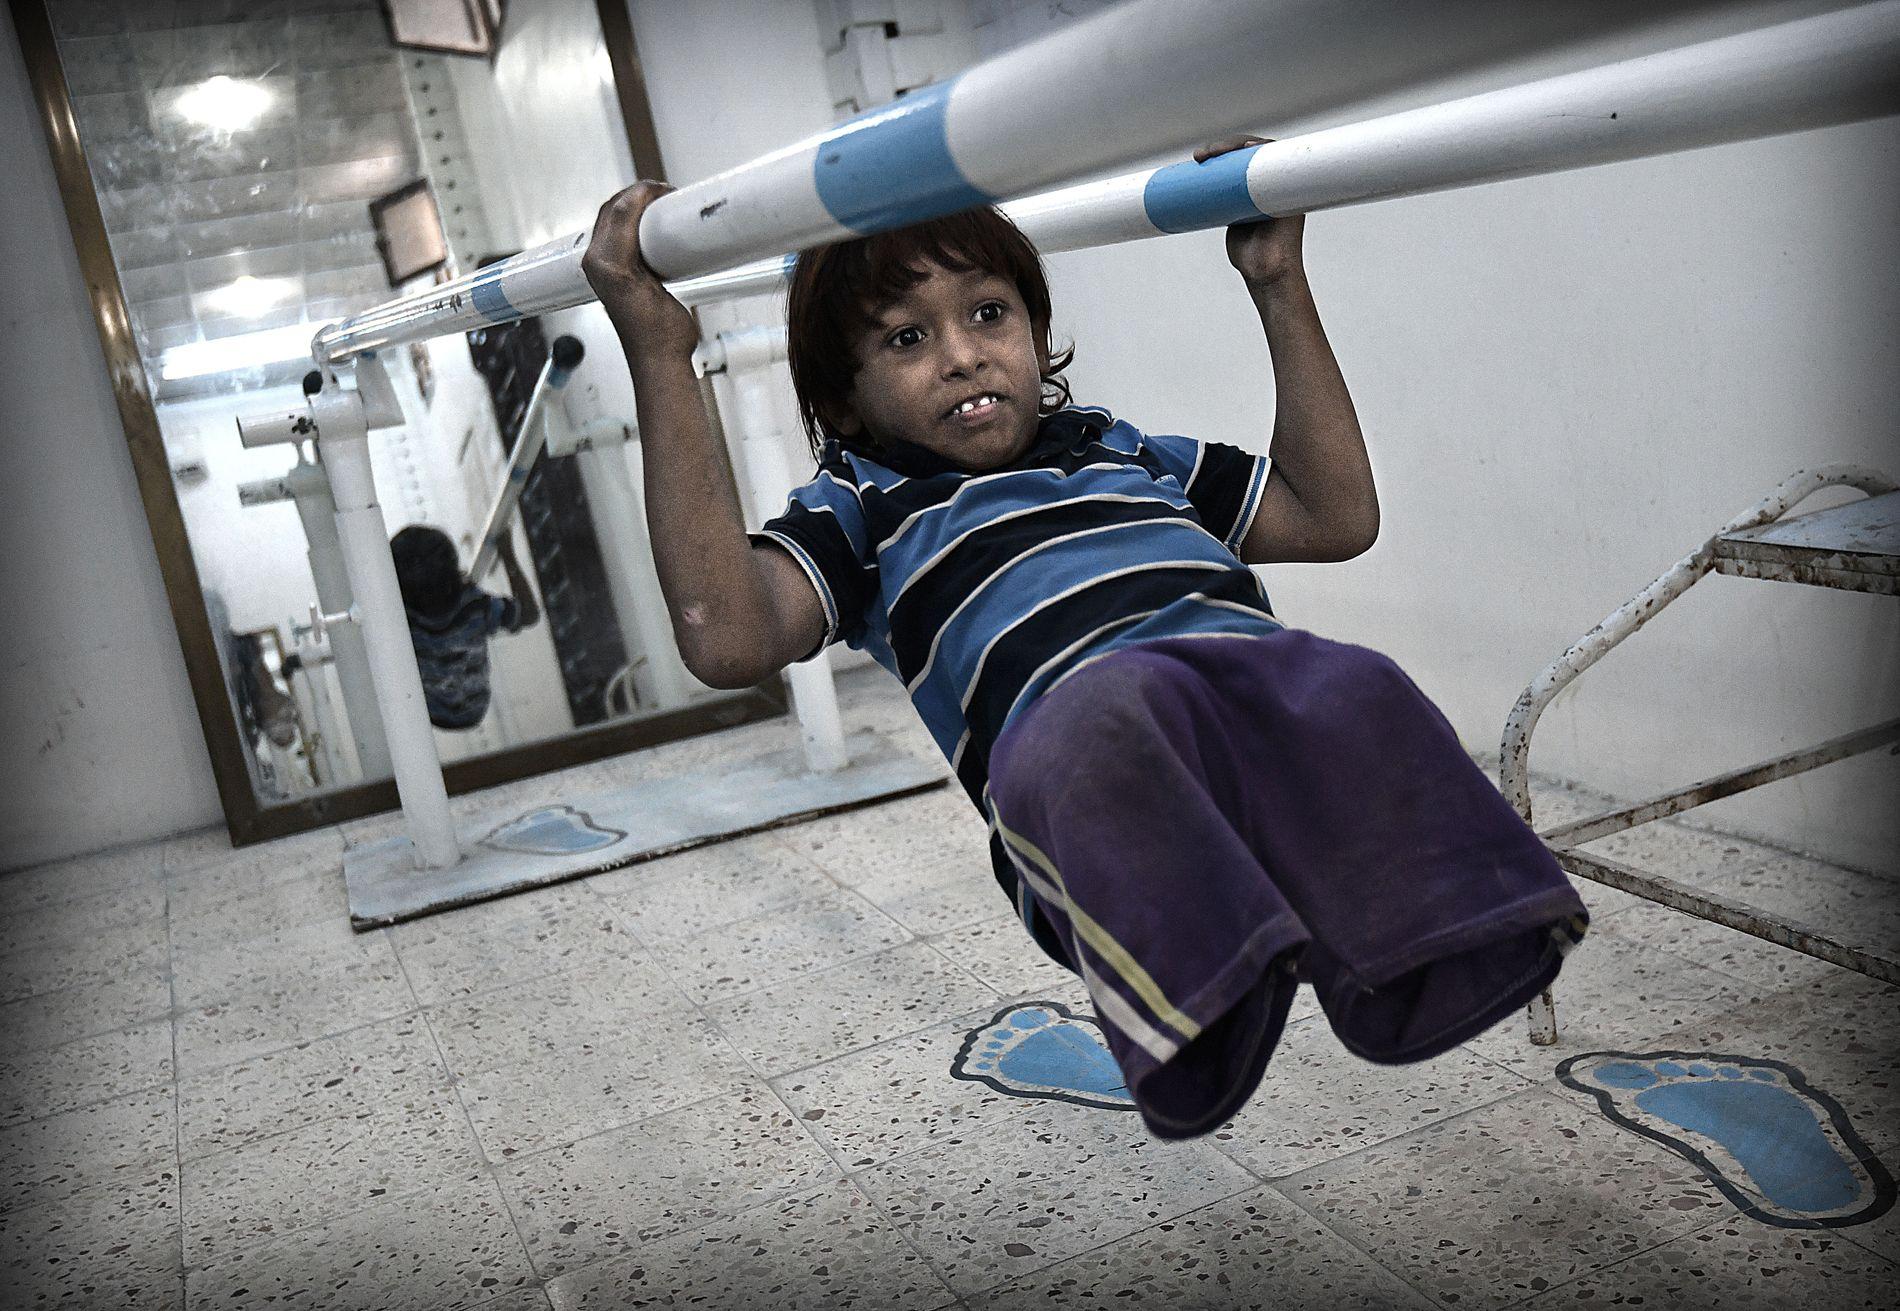 SPRELSK: Emad Yahyah (7) viser stolt frem triksene sine på turnstangen på protesesenteret i Aden.